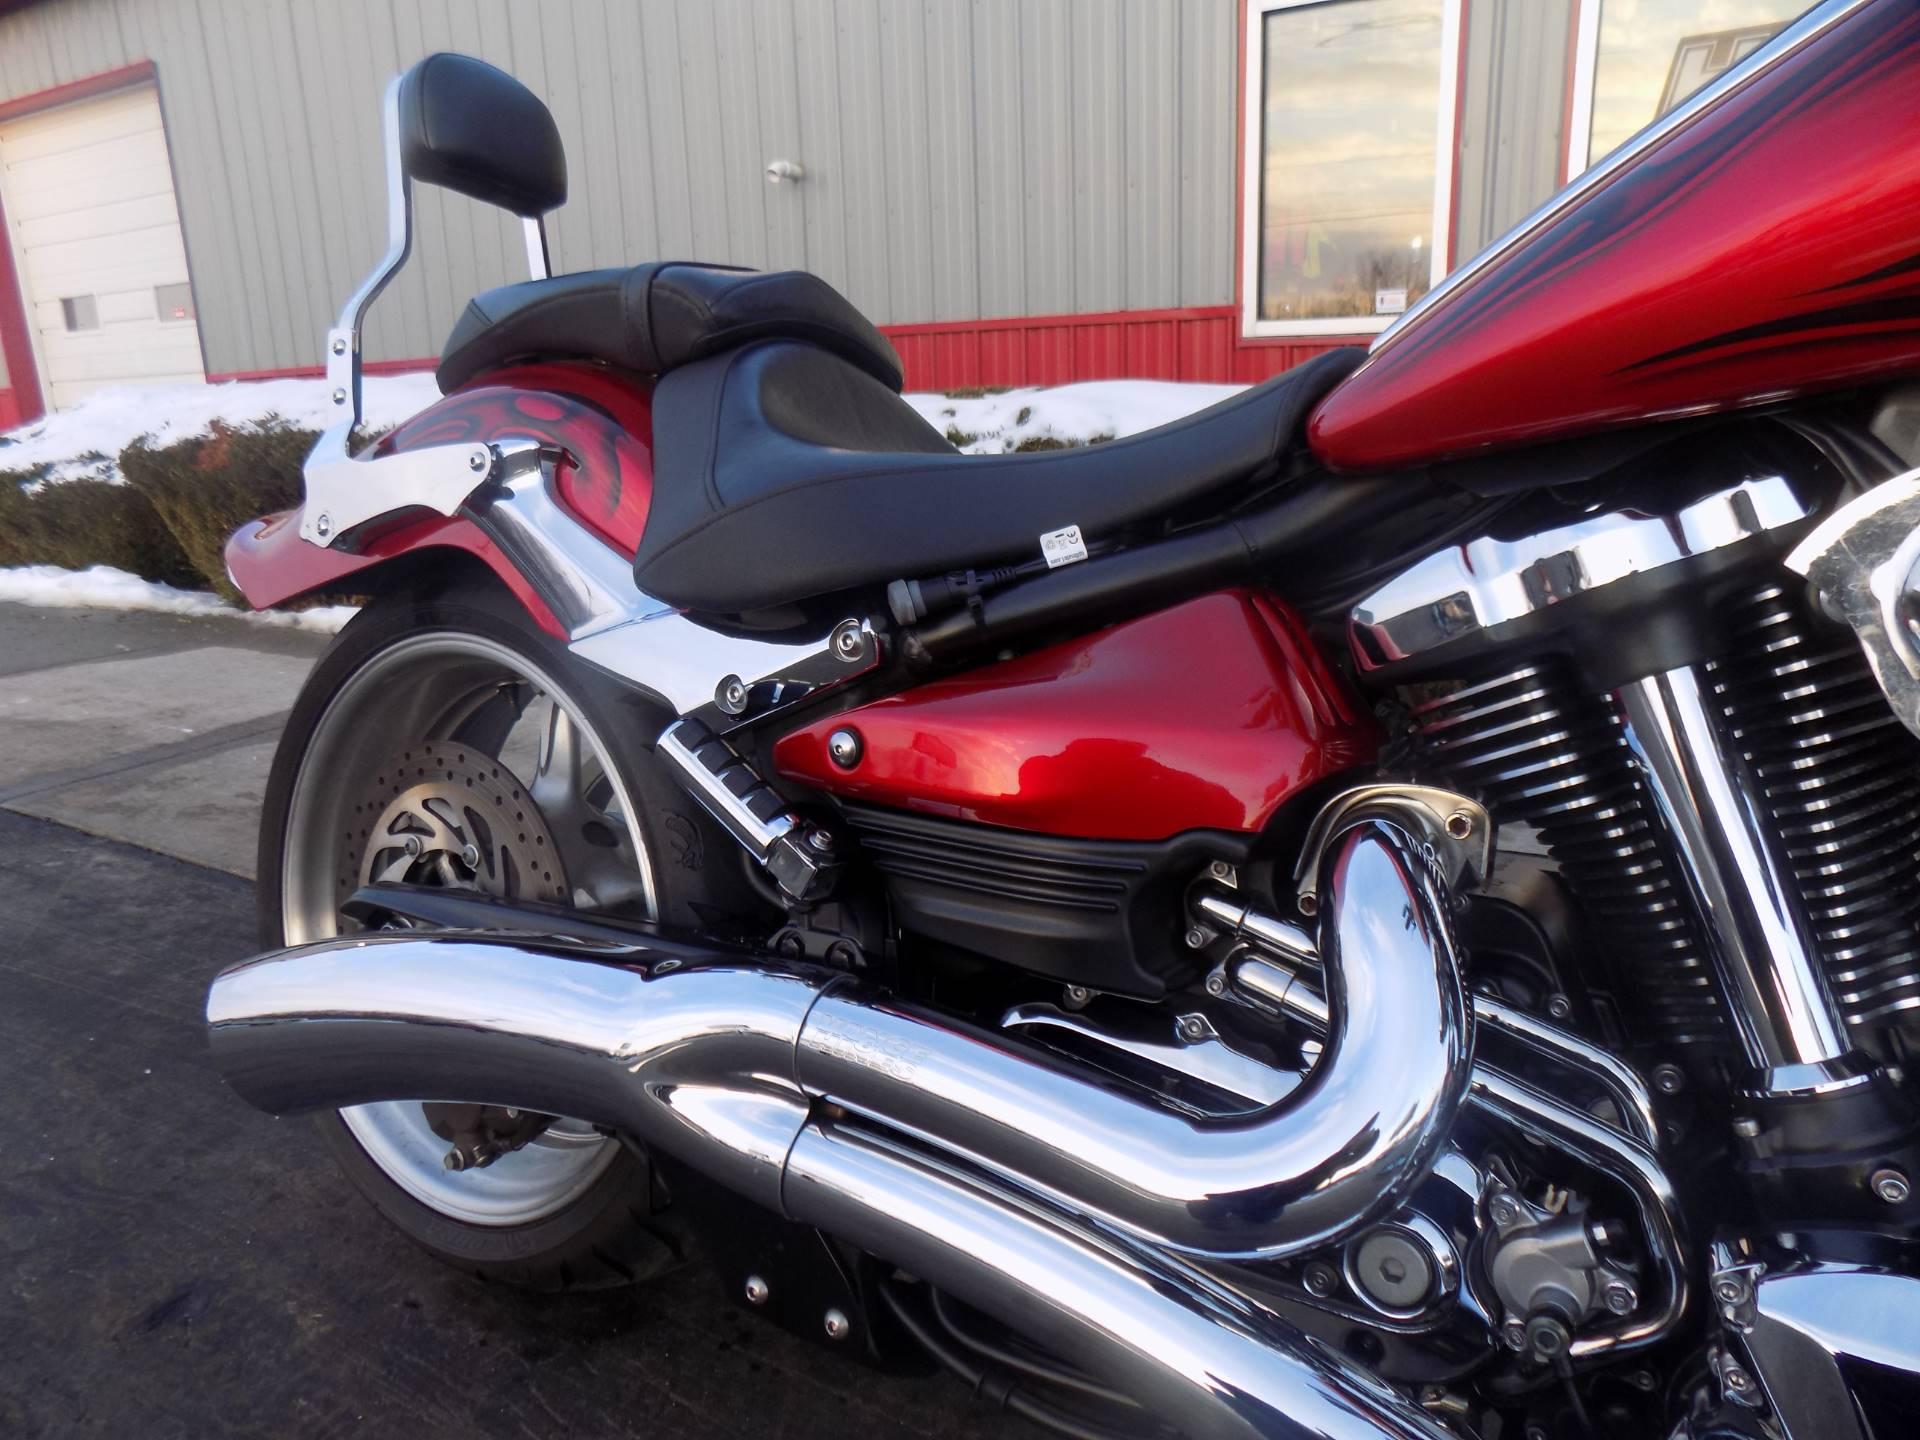 2008 Yamaha Raider S 11